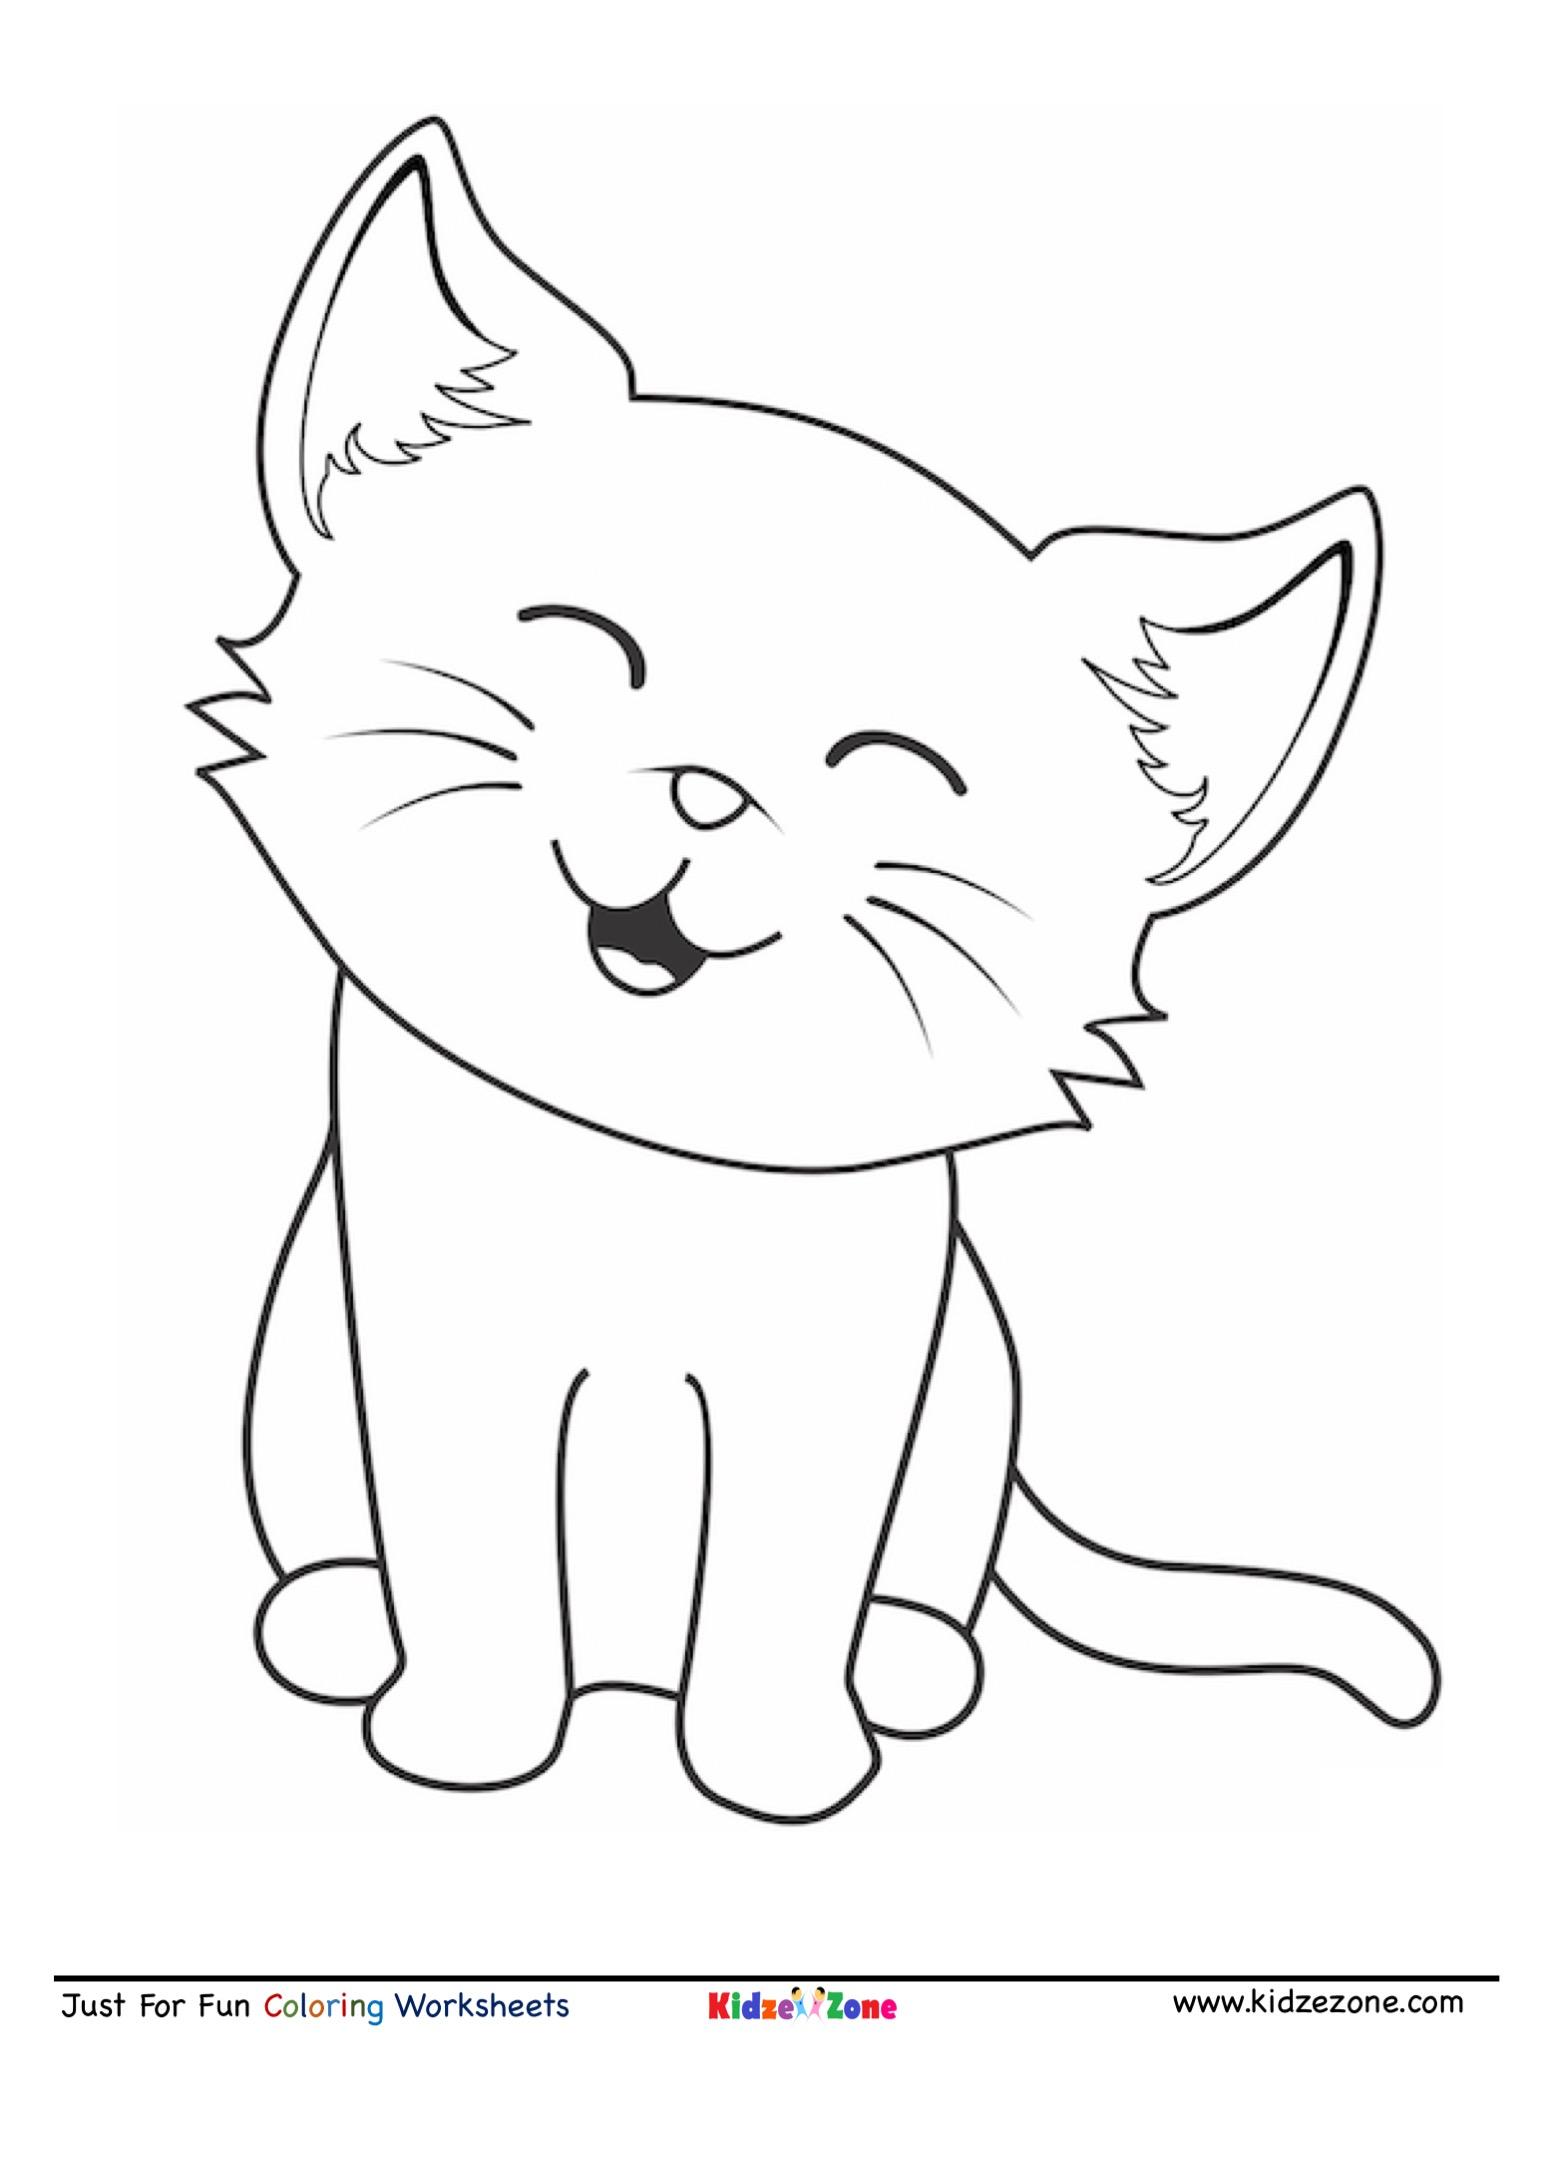 Cute Cat Cartoon Coloring Page - KidzeZone